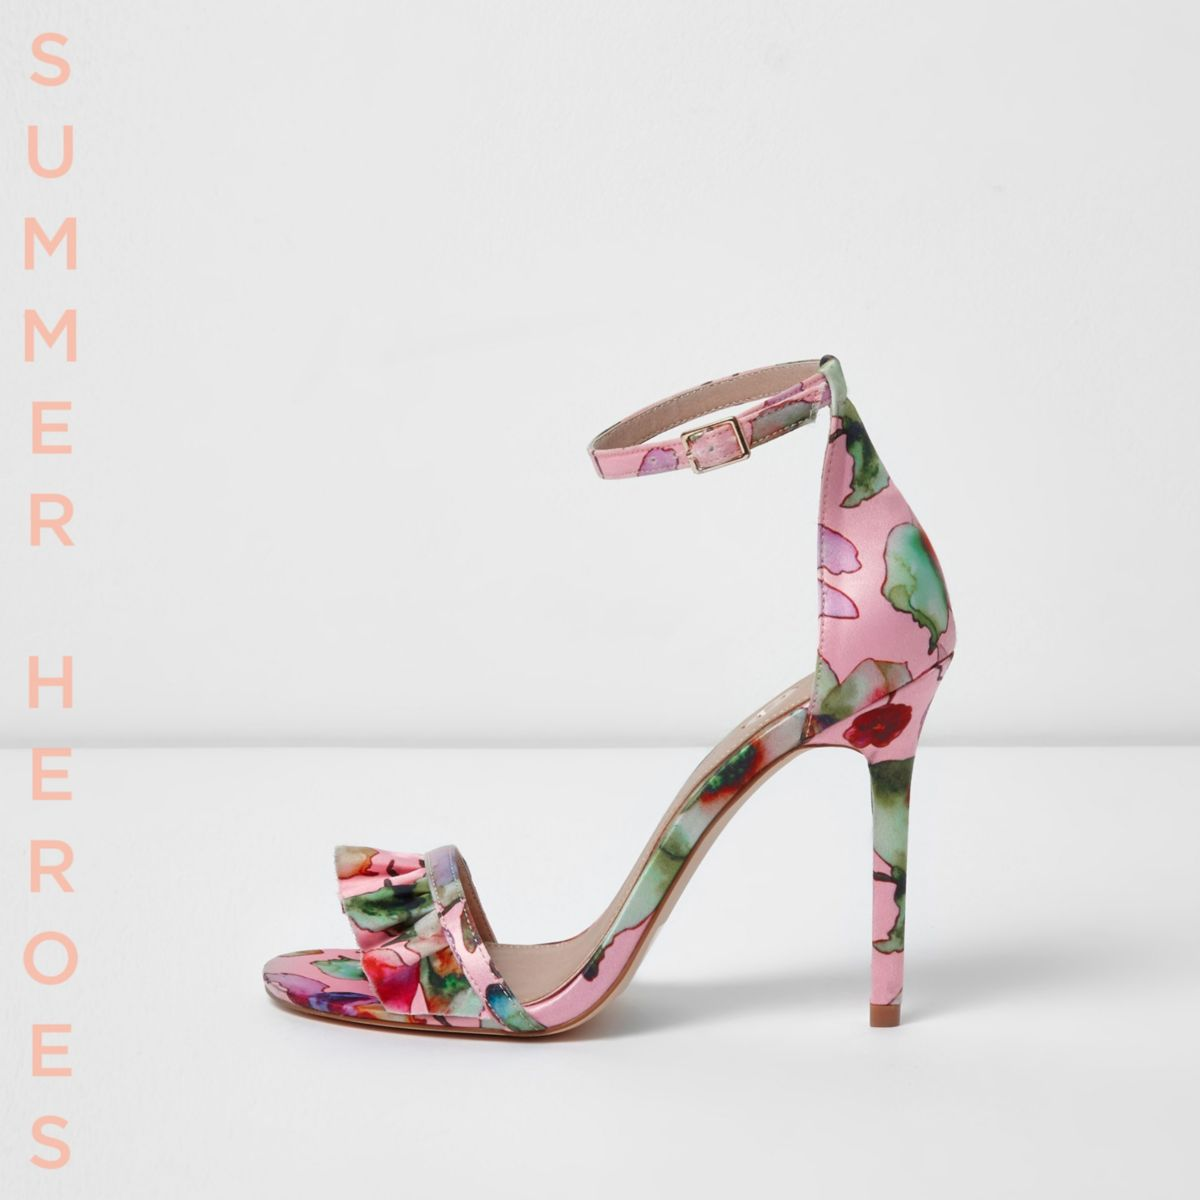 Sandales Minimalistes Rose Avec Semelle Plate wA3lNiRqG